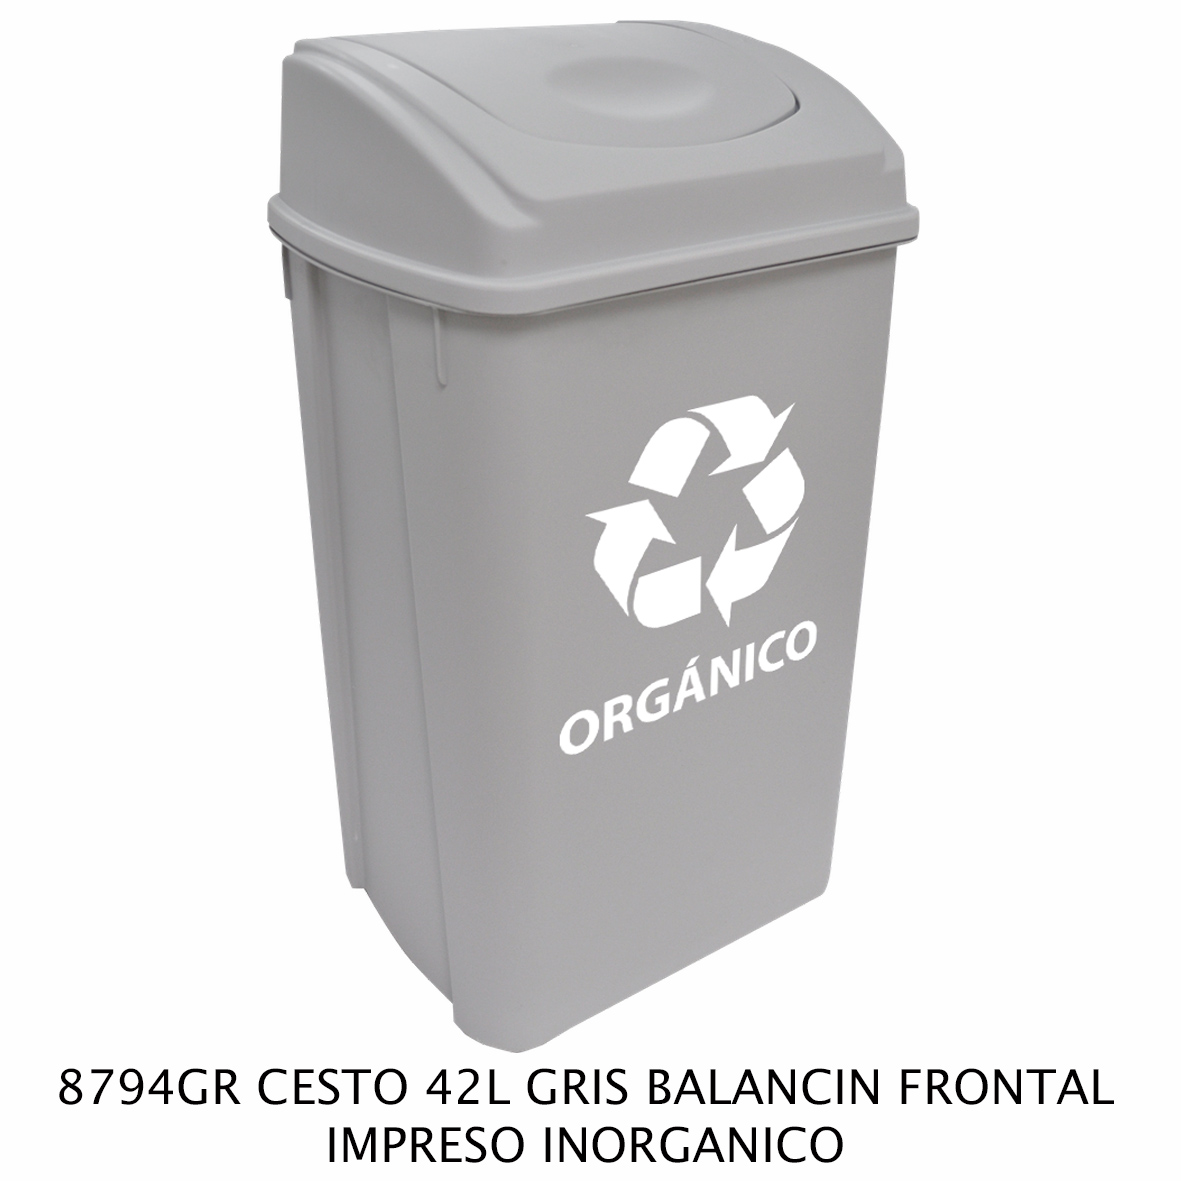 Bote de basura de 42 litros con balancín frontal color gris modelo 8794GR impreso inorgánico de Sablón